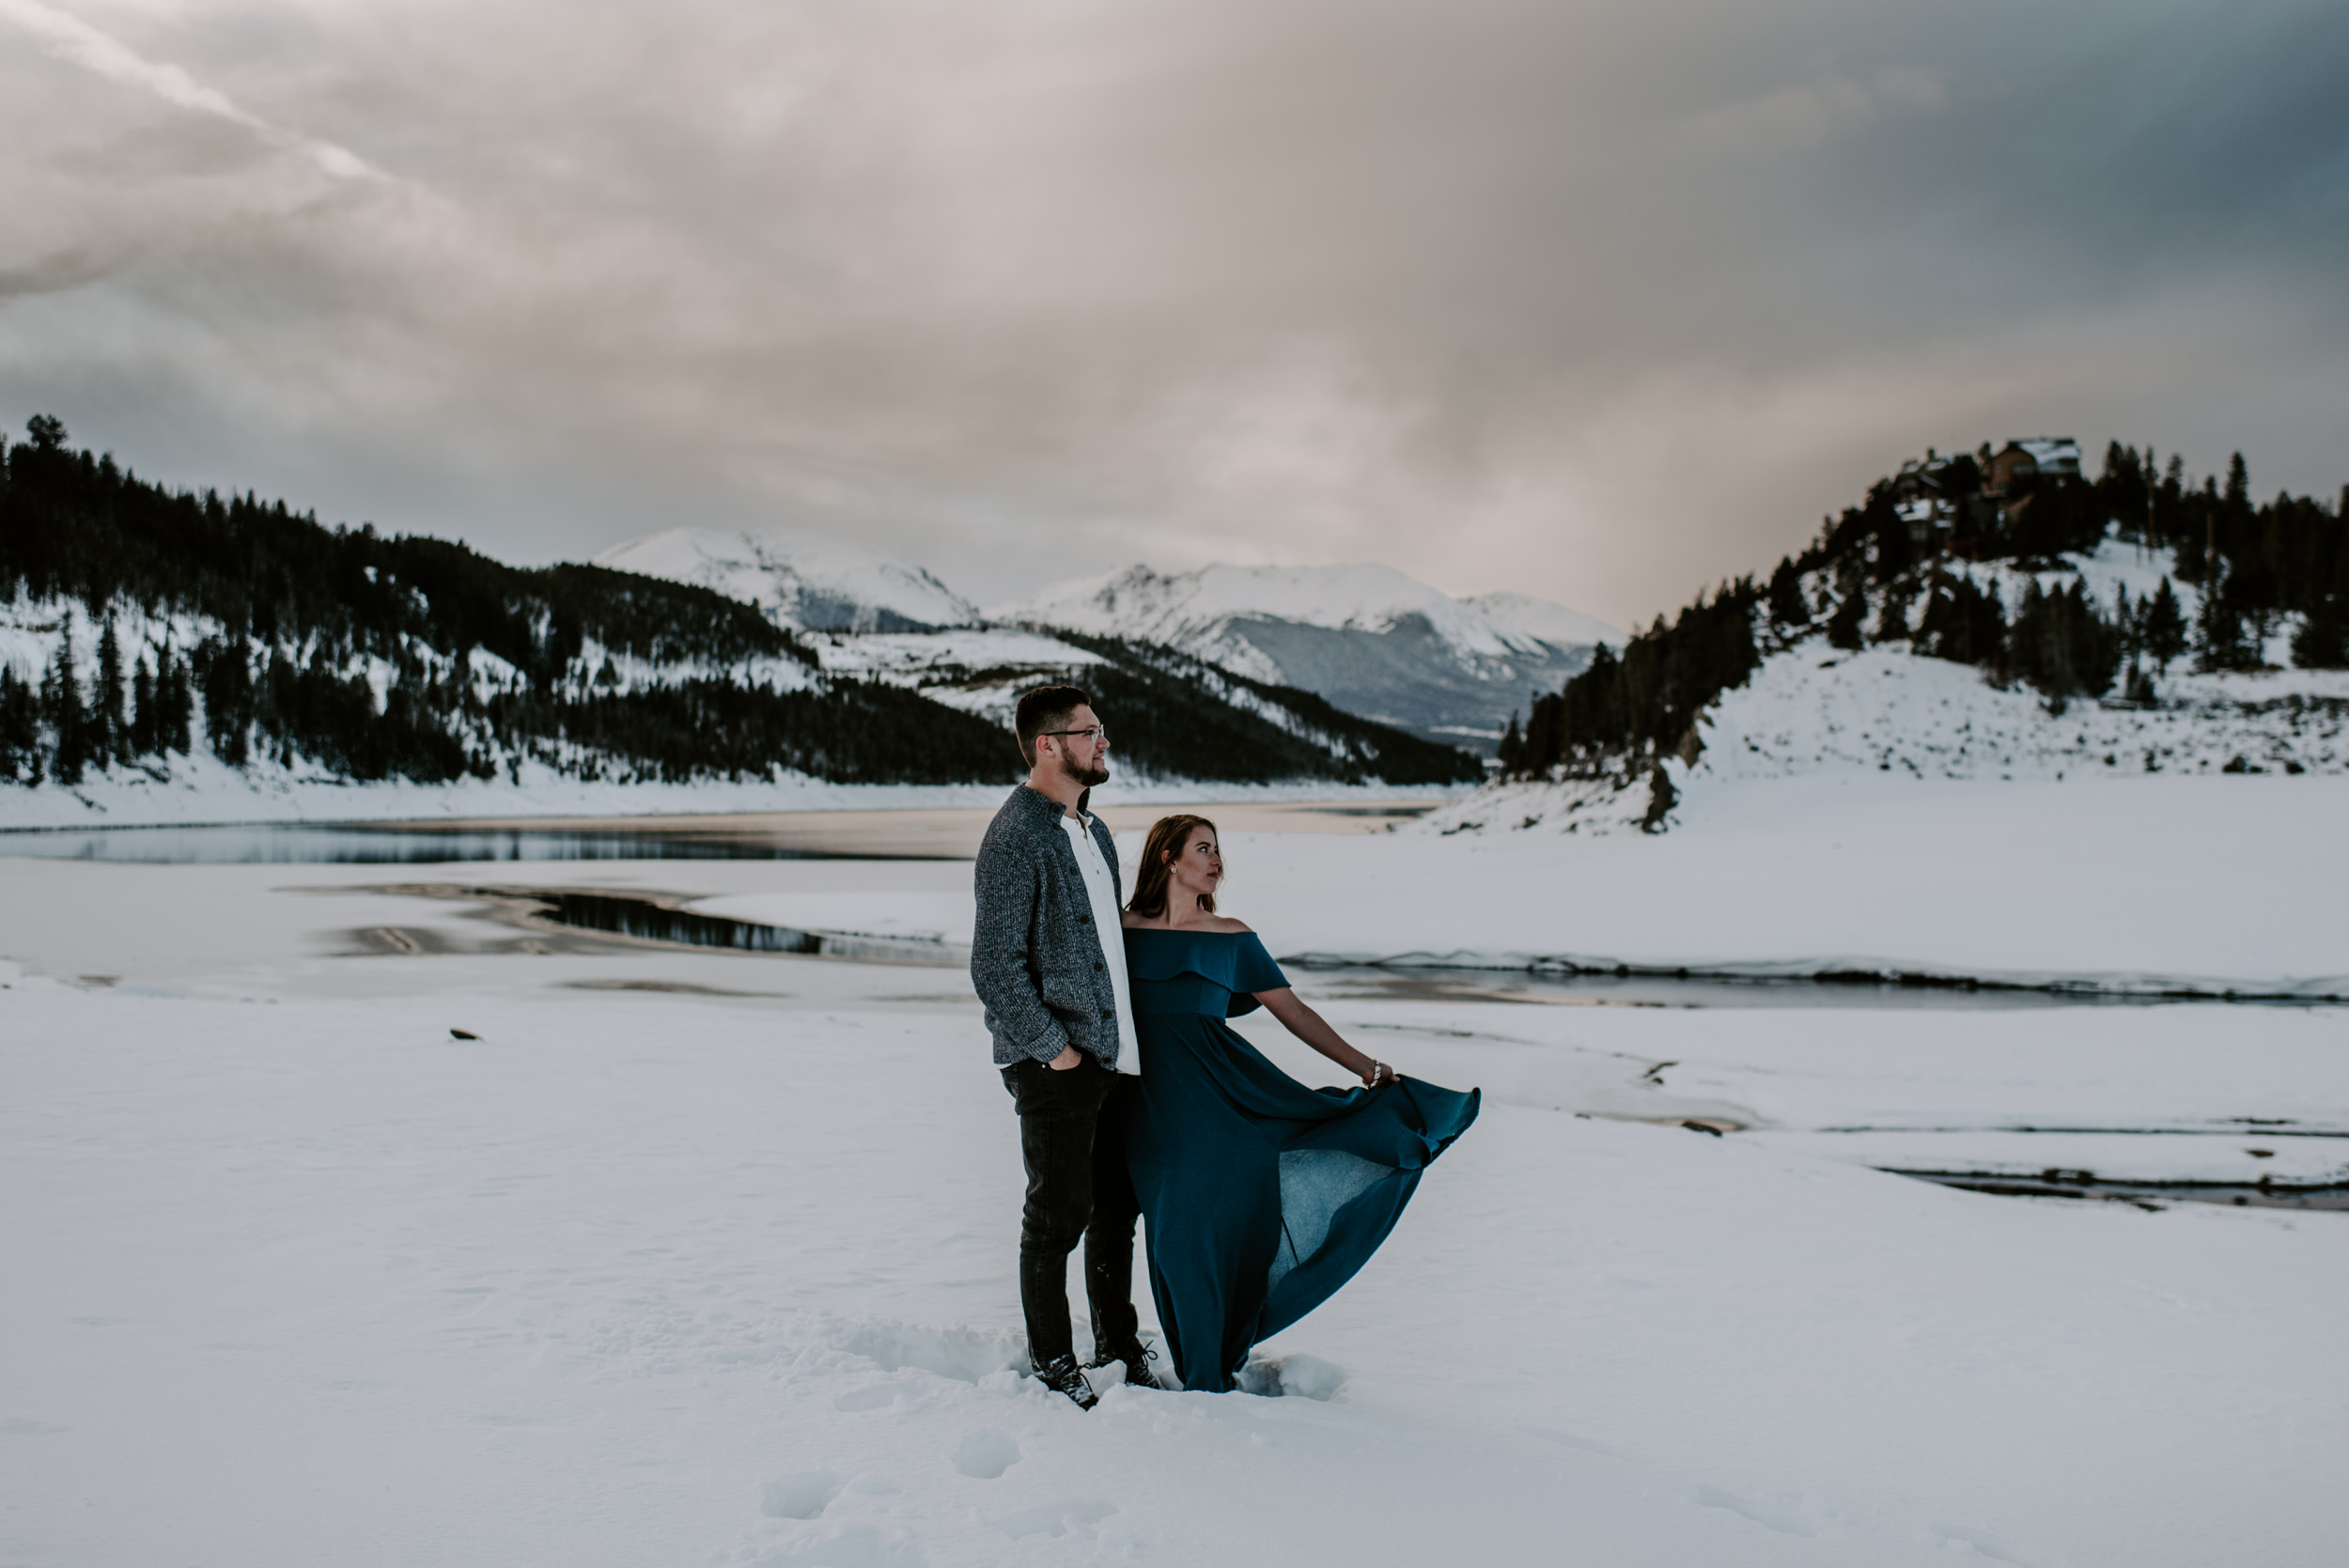 Lake Dillon engagement session. Colorado winter engagement photos. Colorado wedding and elopement photographer.